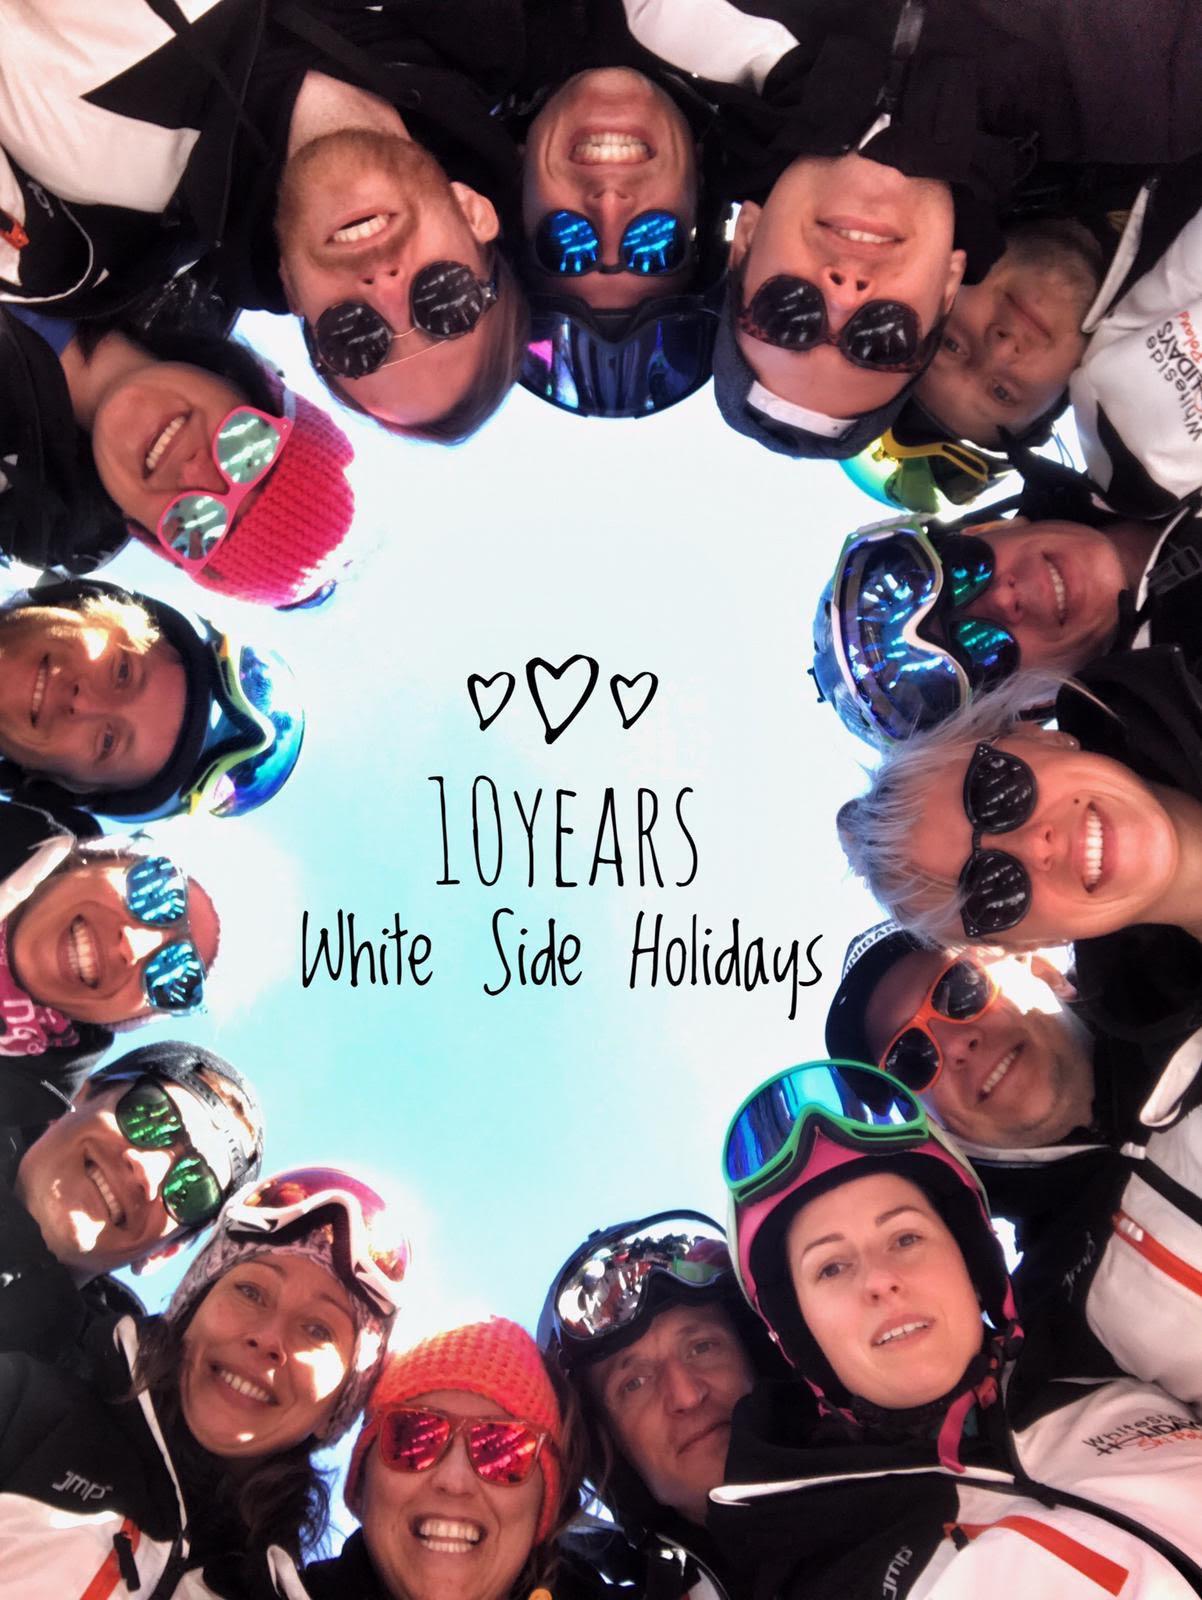 White Side Holidays Poland, Ski and Snowboard Instructors celebrating 10 years in Zakopane